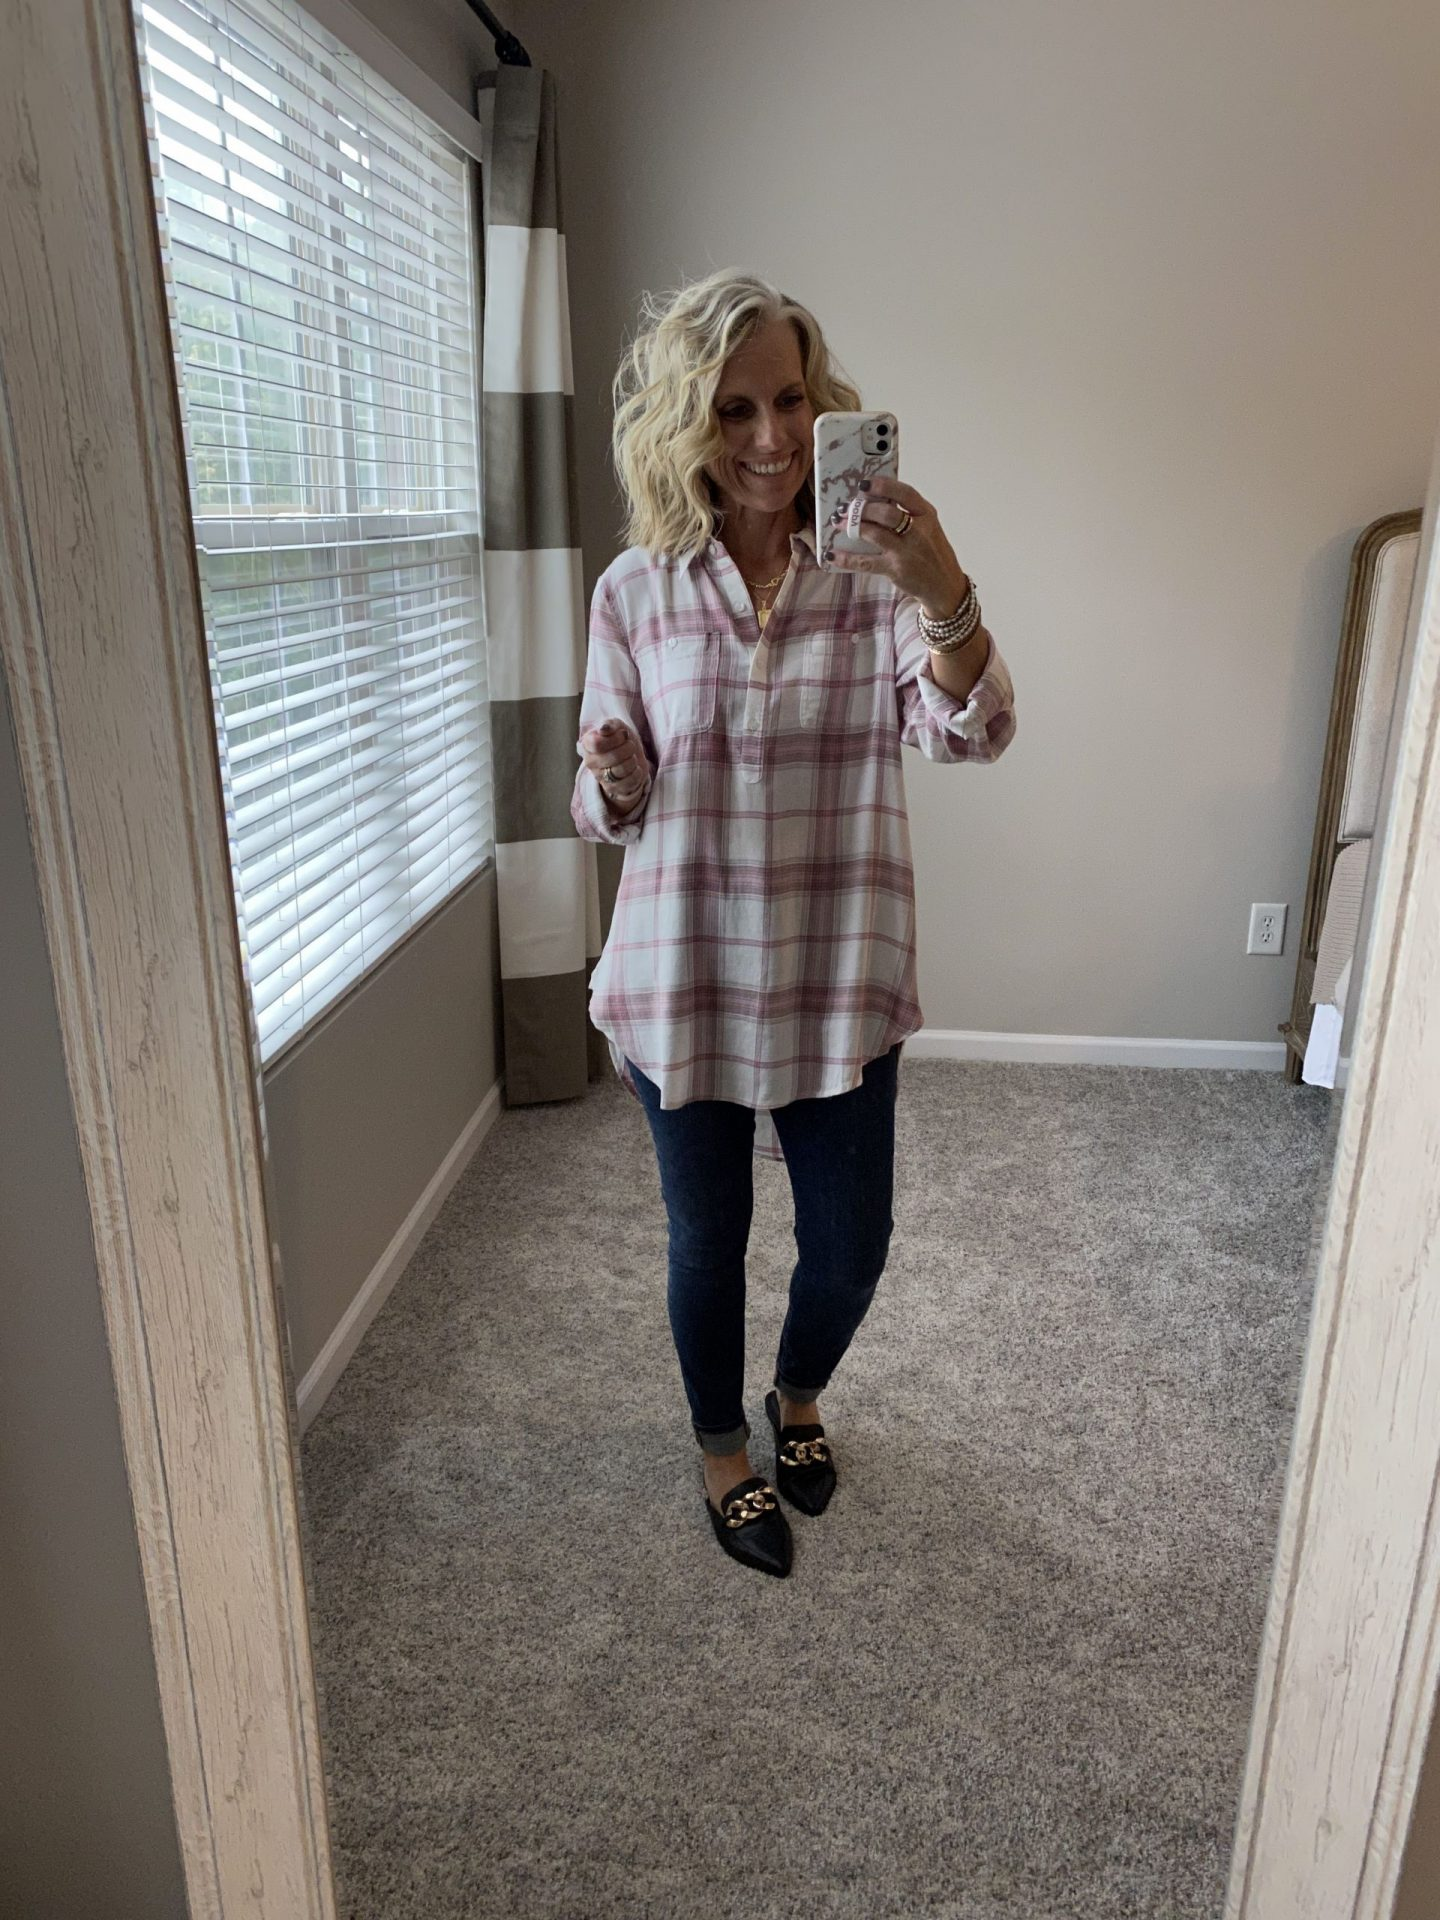 Wearing lately